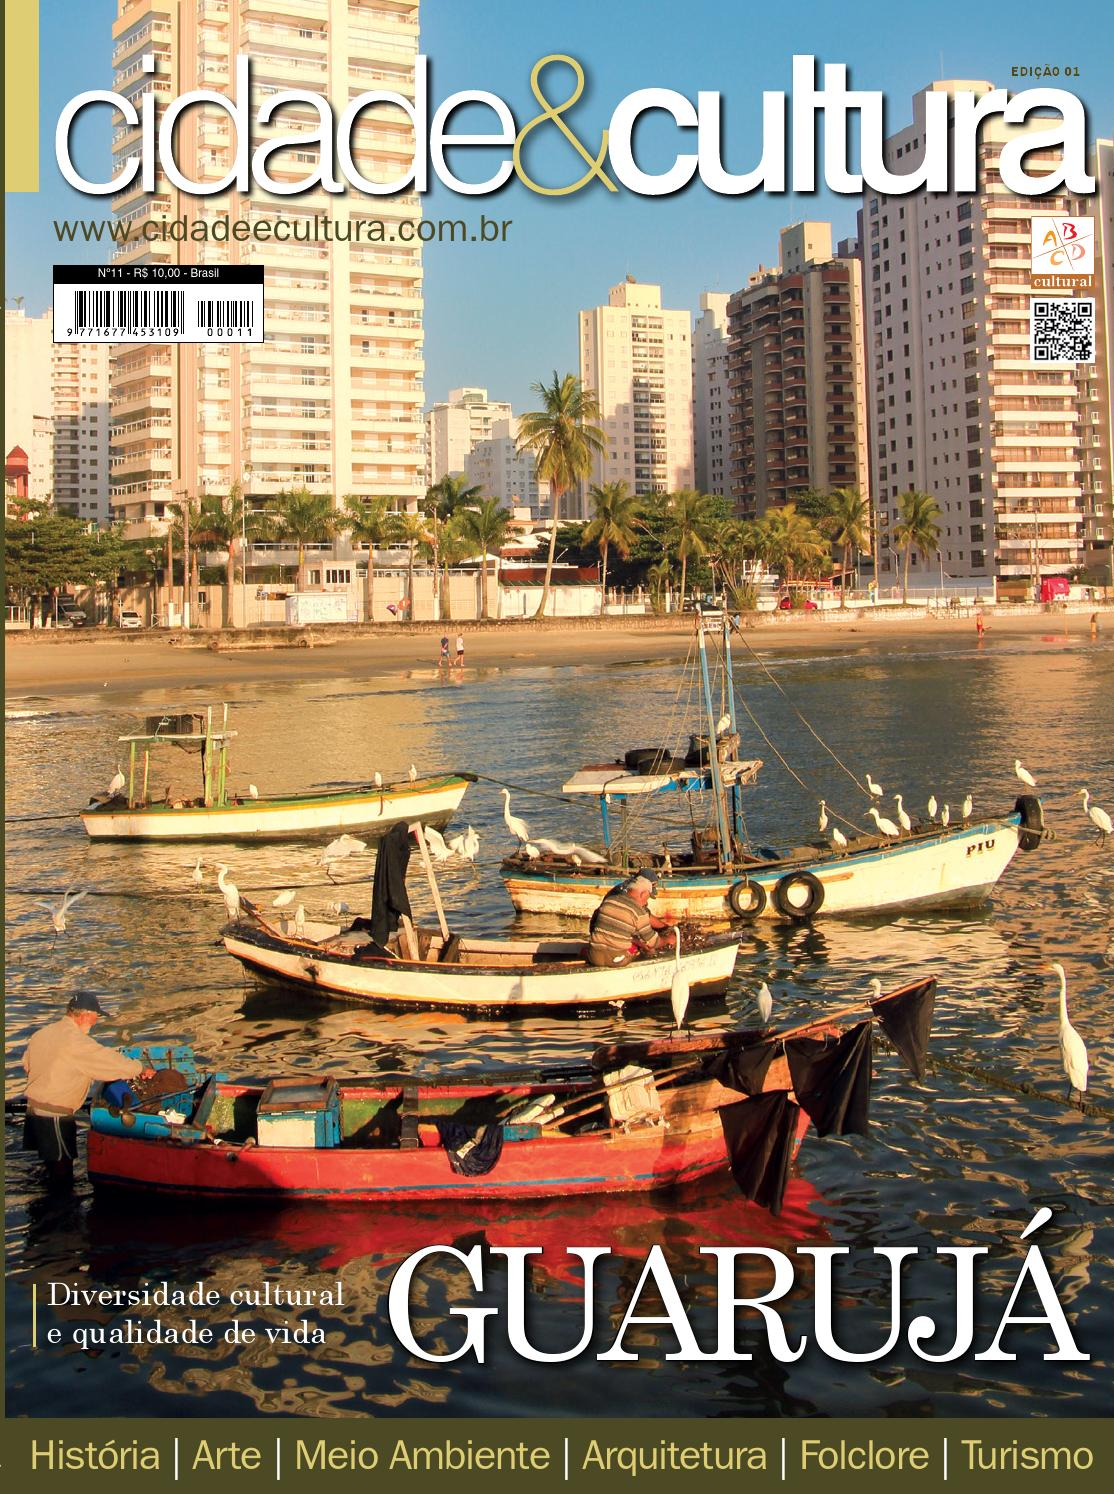 d4e9b36bcd Guaruja SP by www.cidadeecultura.com.br - issuu